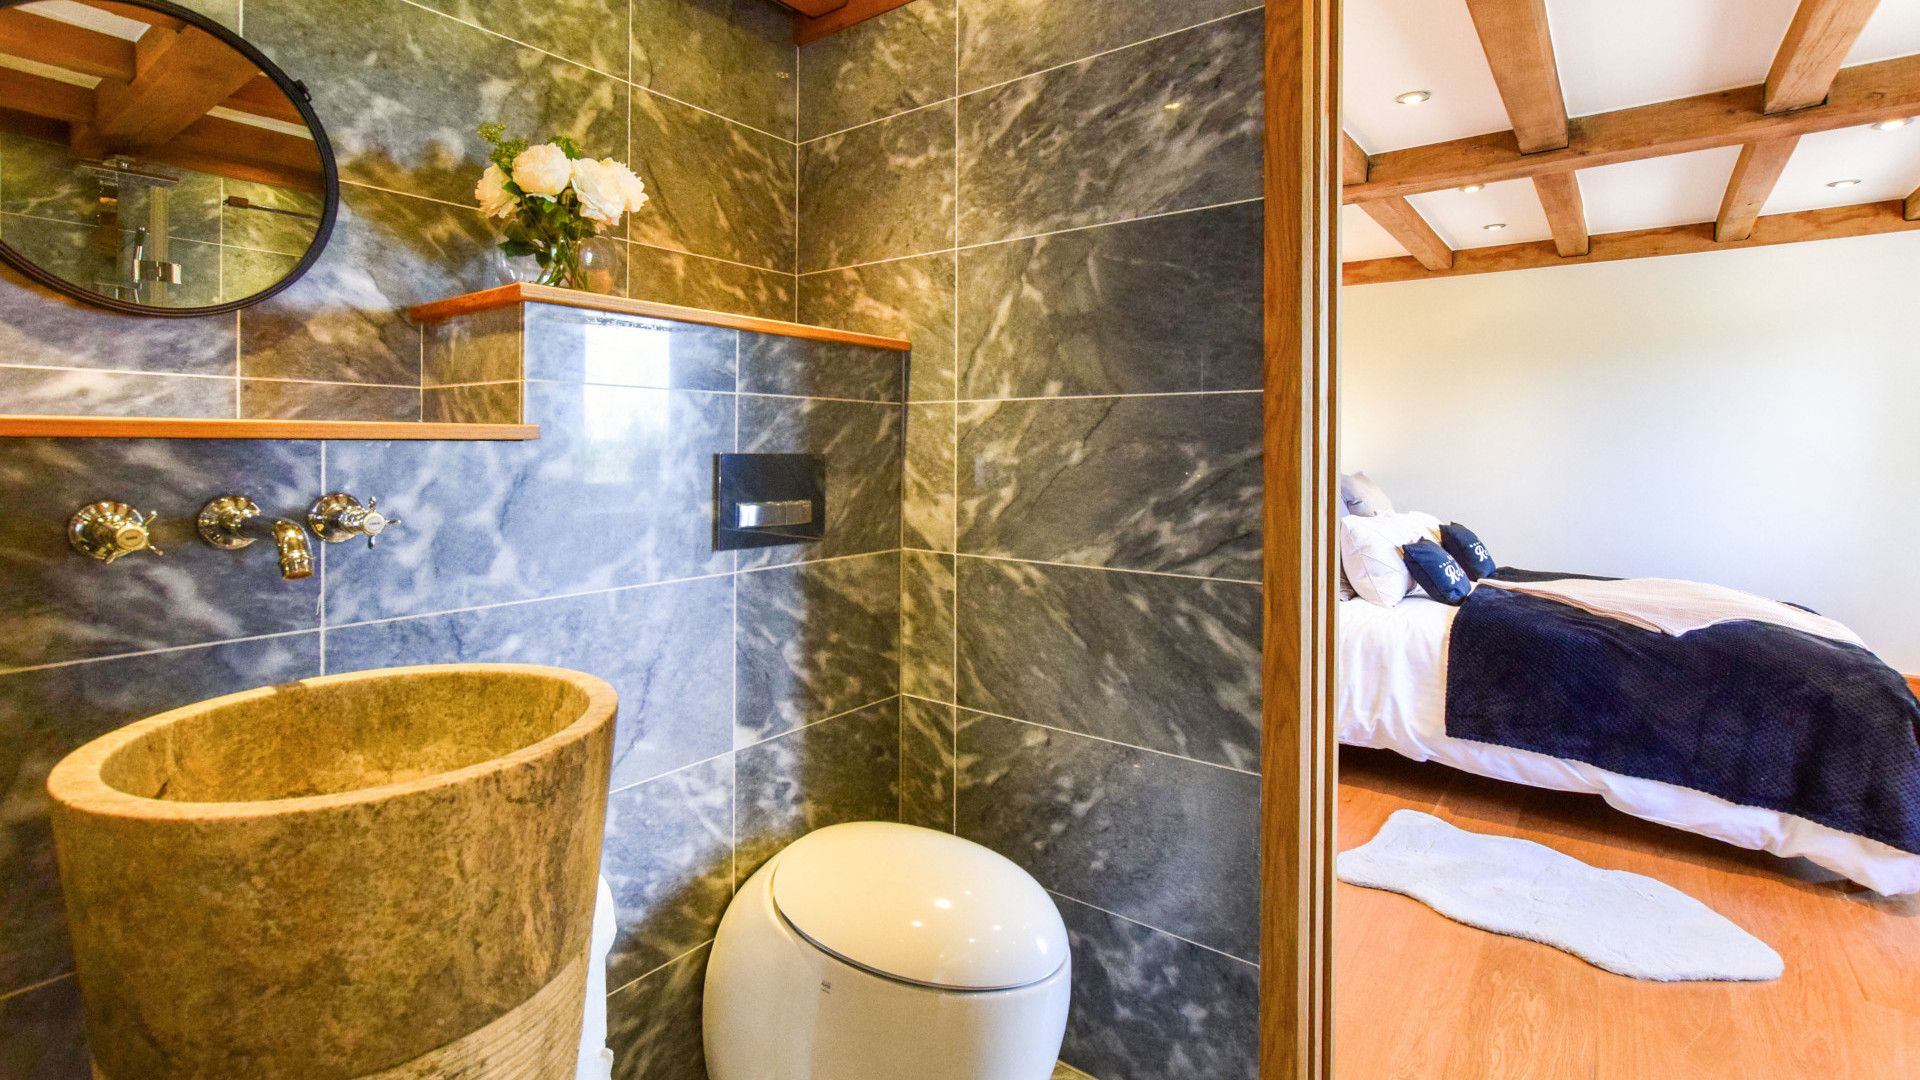 Jack and Jill En-Suite, Old Oak House, Bolthole Retreats